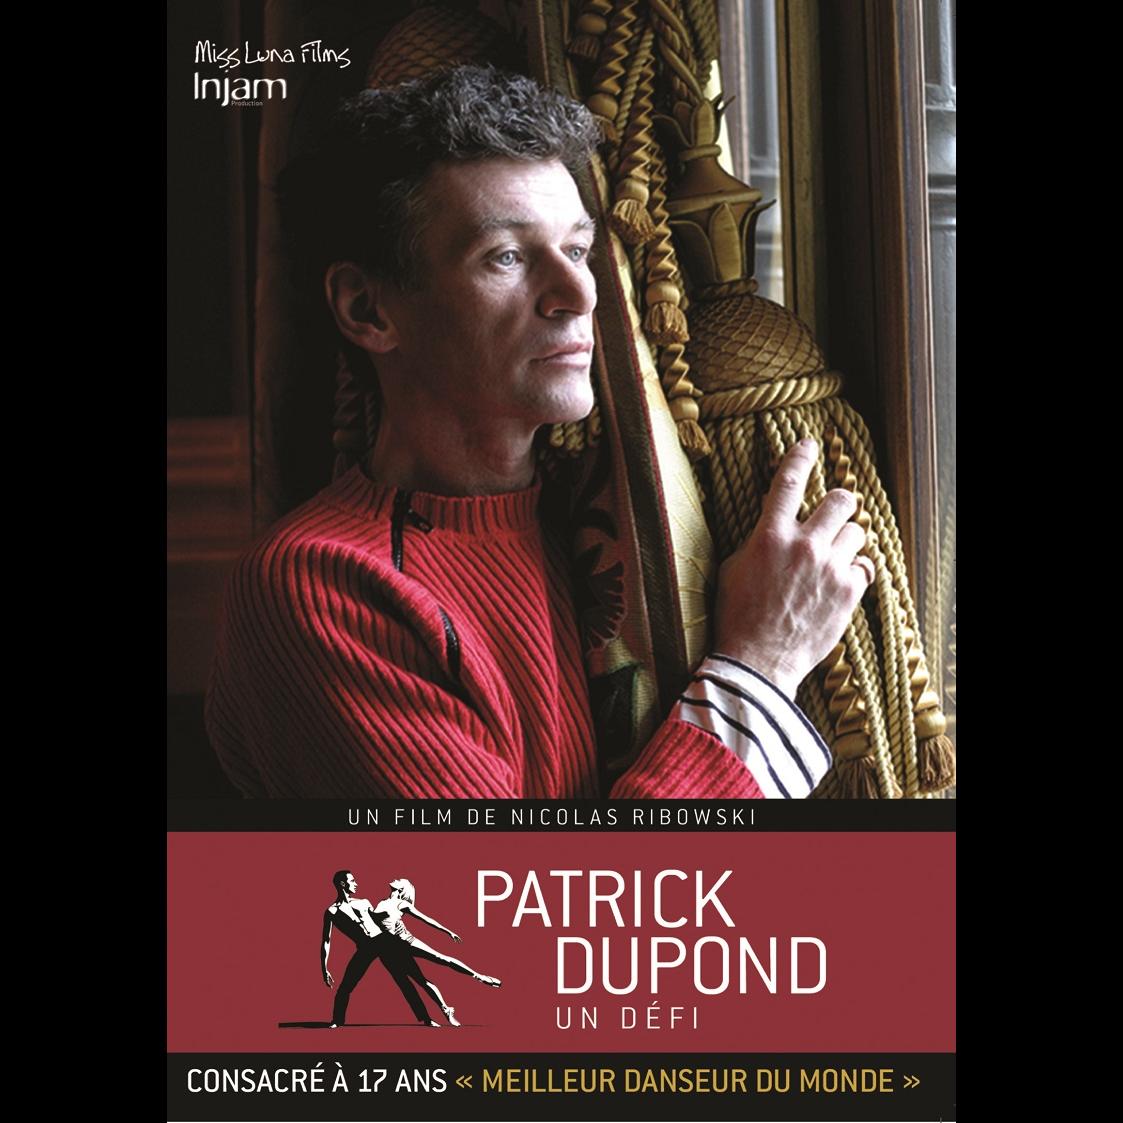 DVD INJ023 Patrick Dupond, Un défi, film documentaire de Nicolas Ribowski.